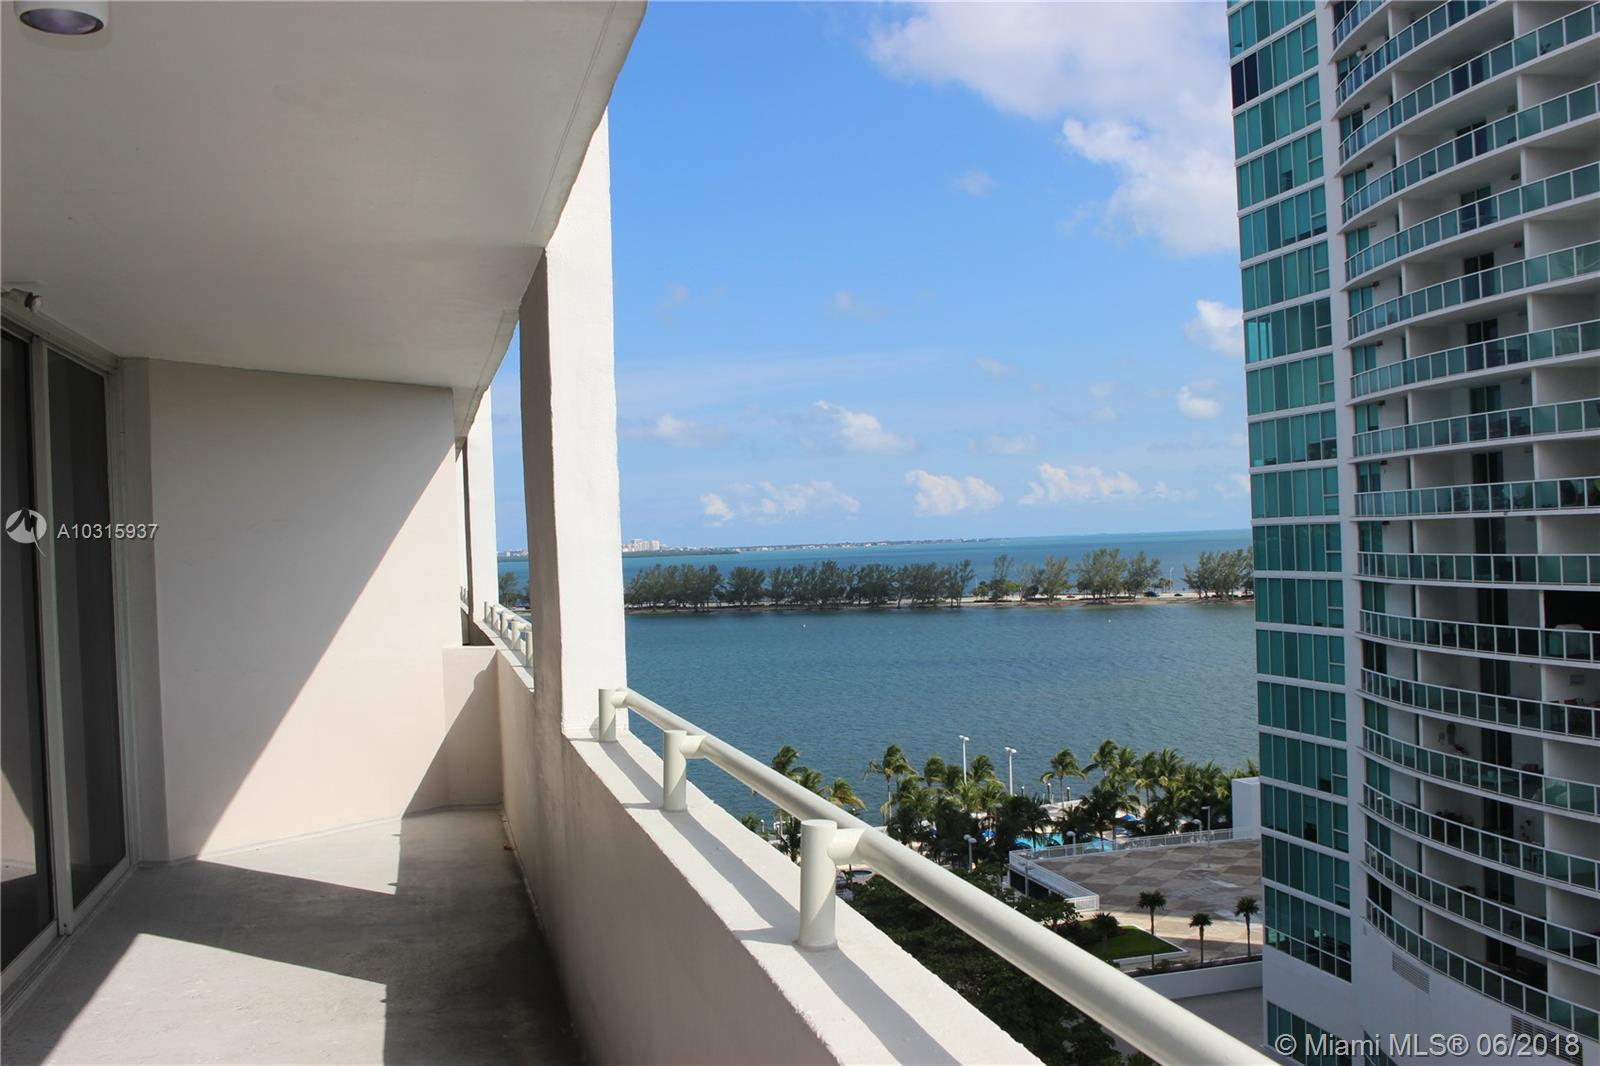 2025 Brickell Avenue, Miami, FL 33129, Atlantis on Brickell #1506, Brickell, Miami A10315937 image #18